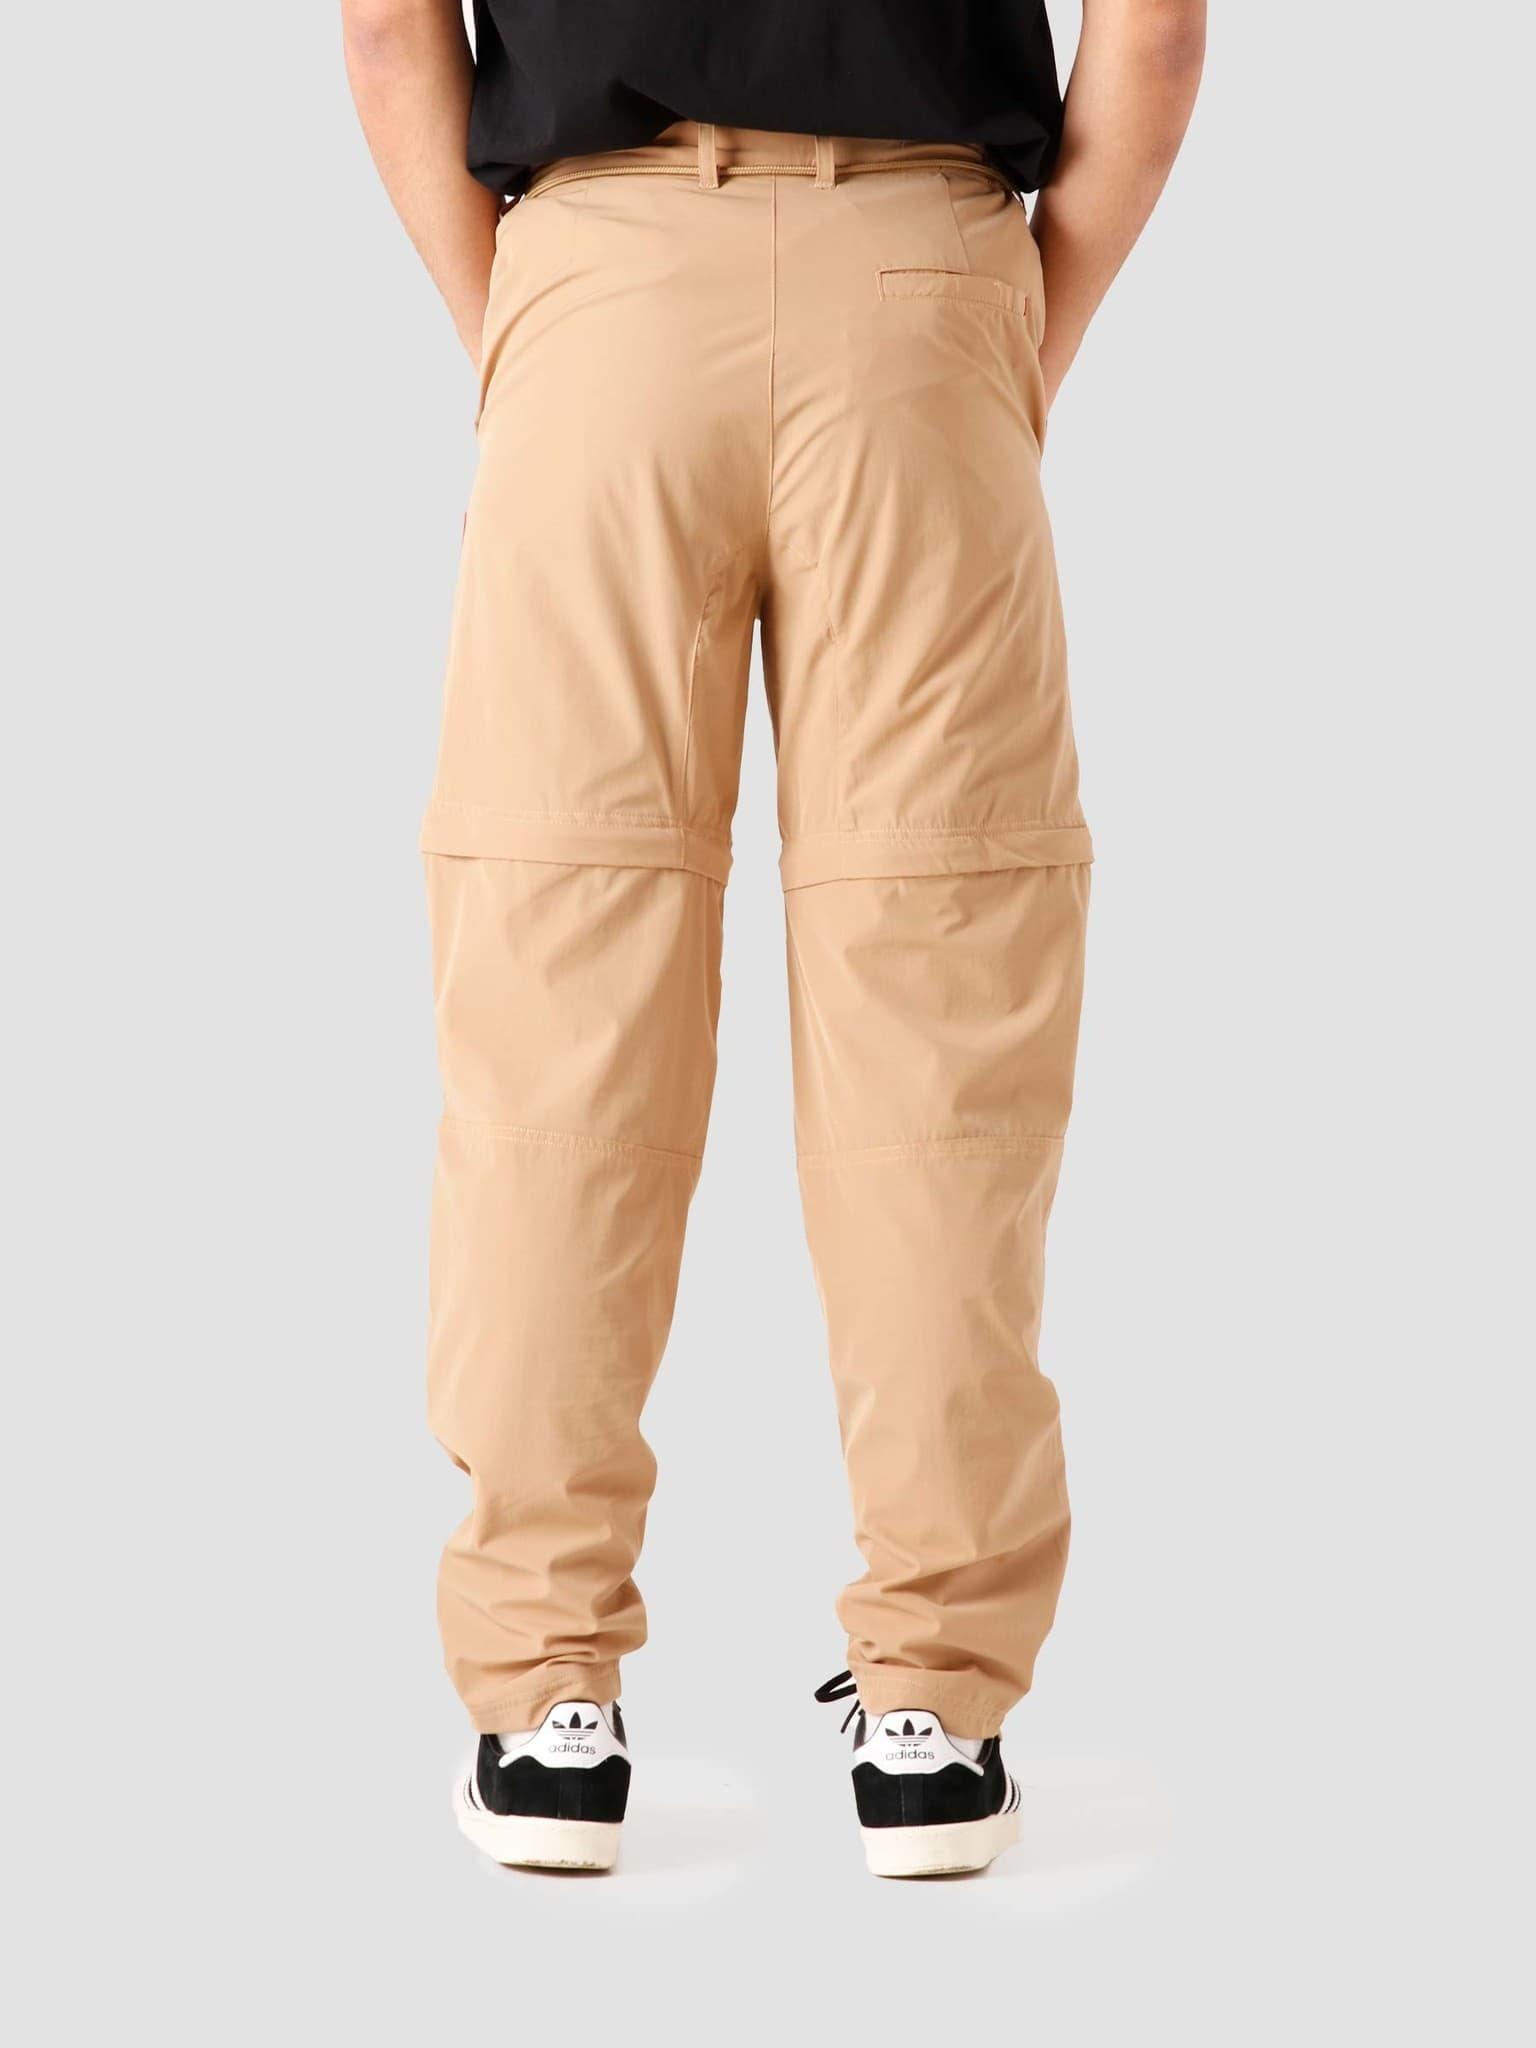 Parachute Trousers Sand